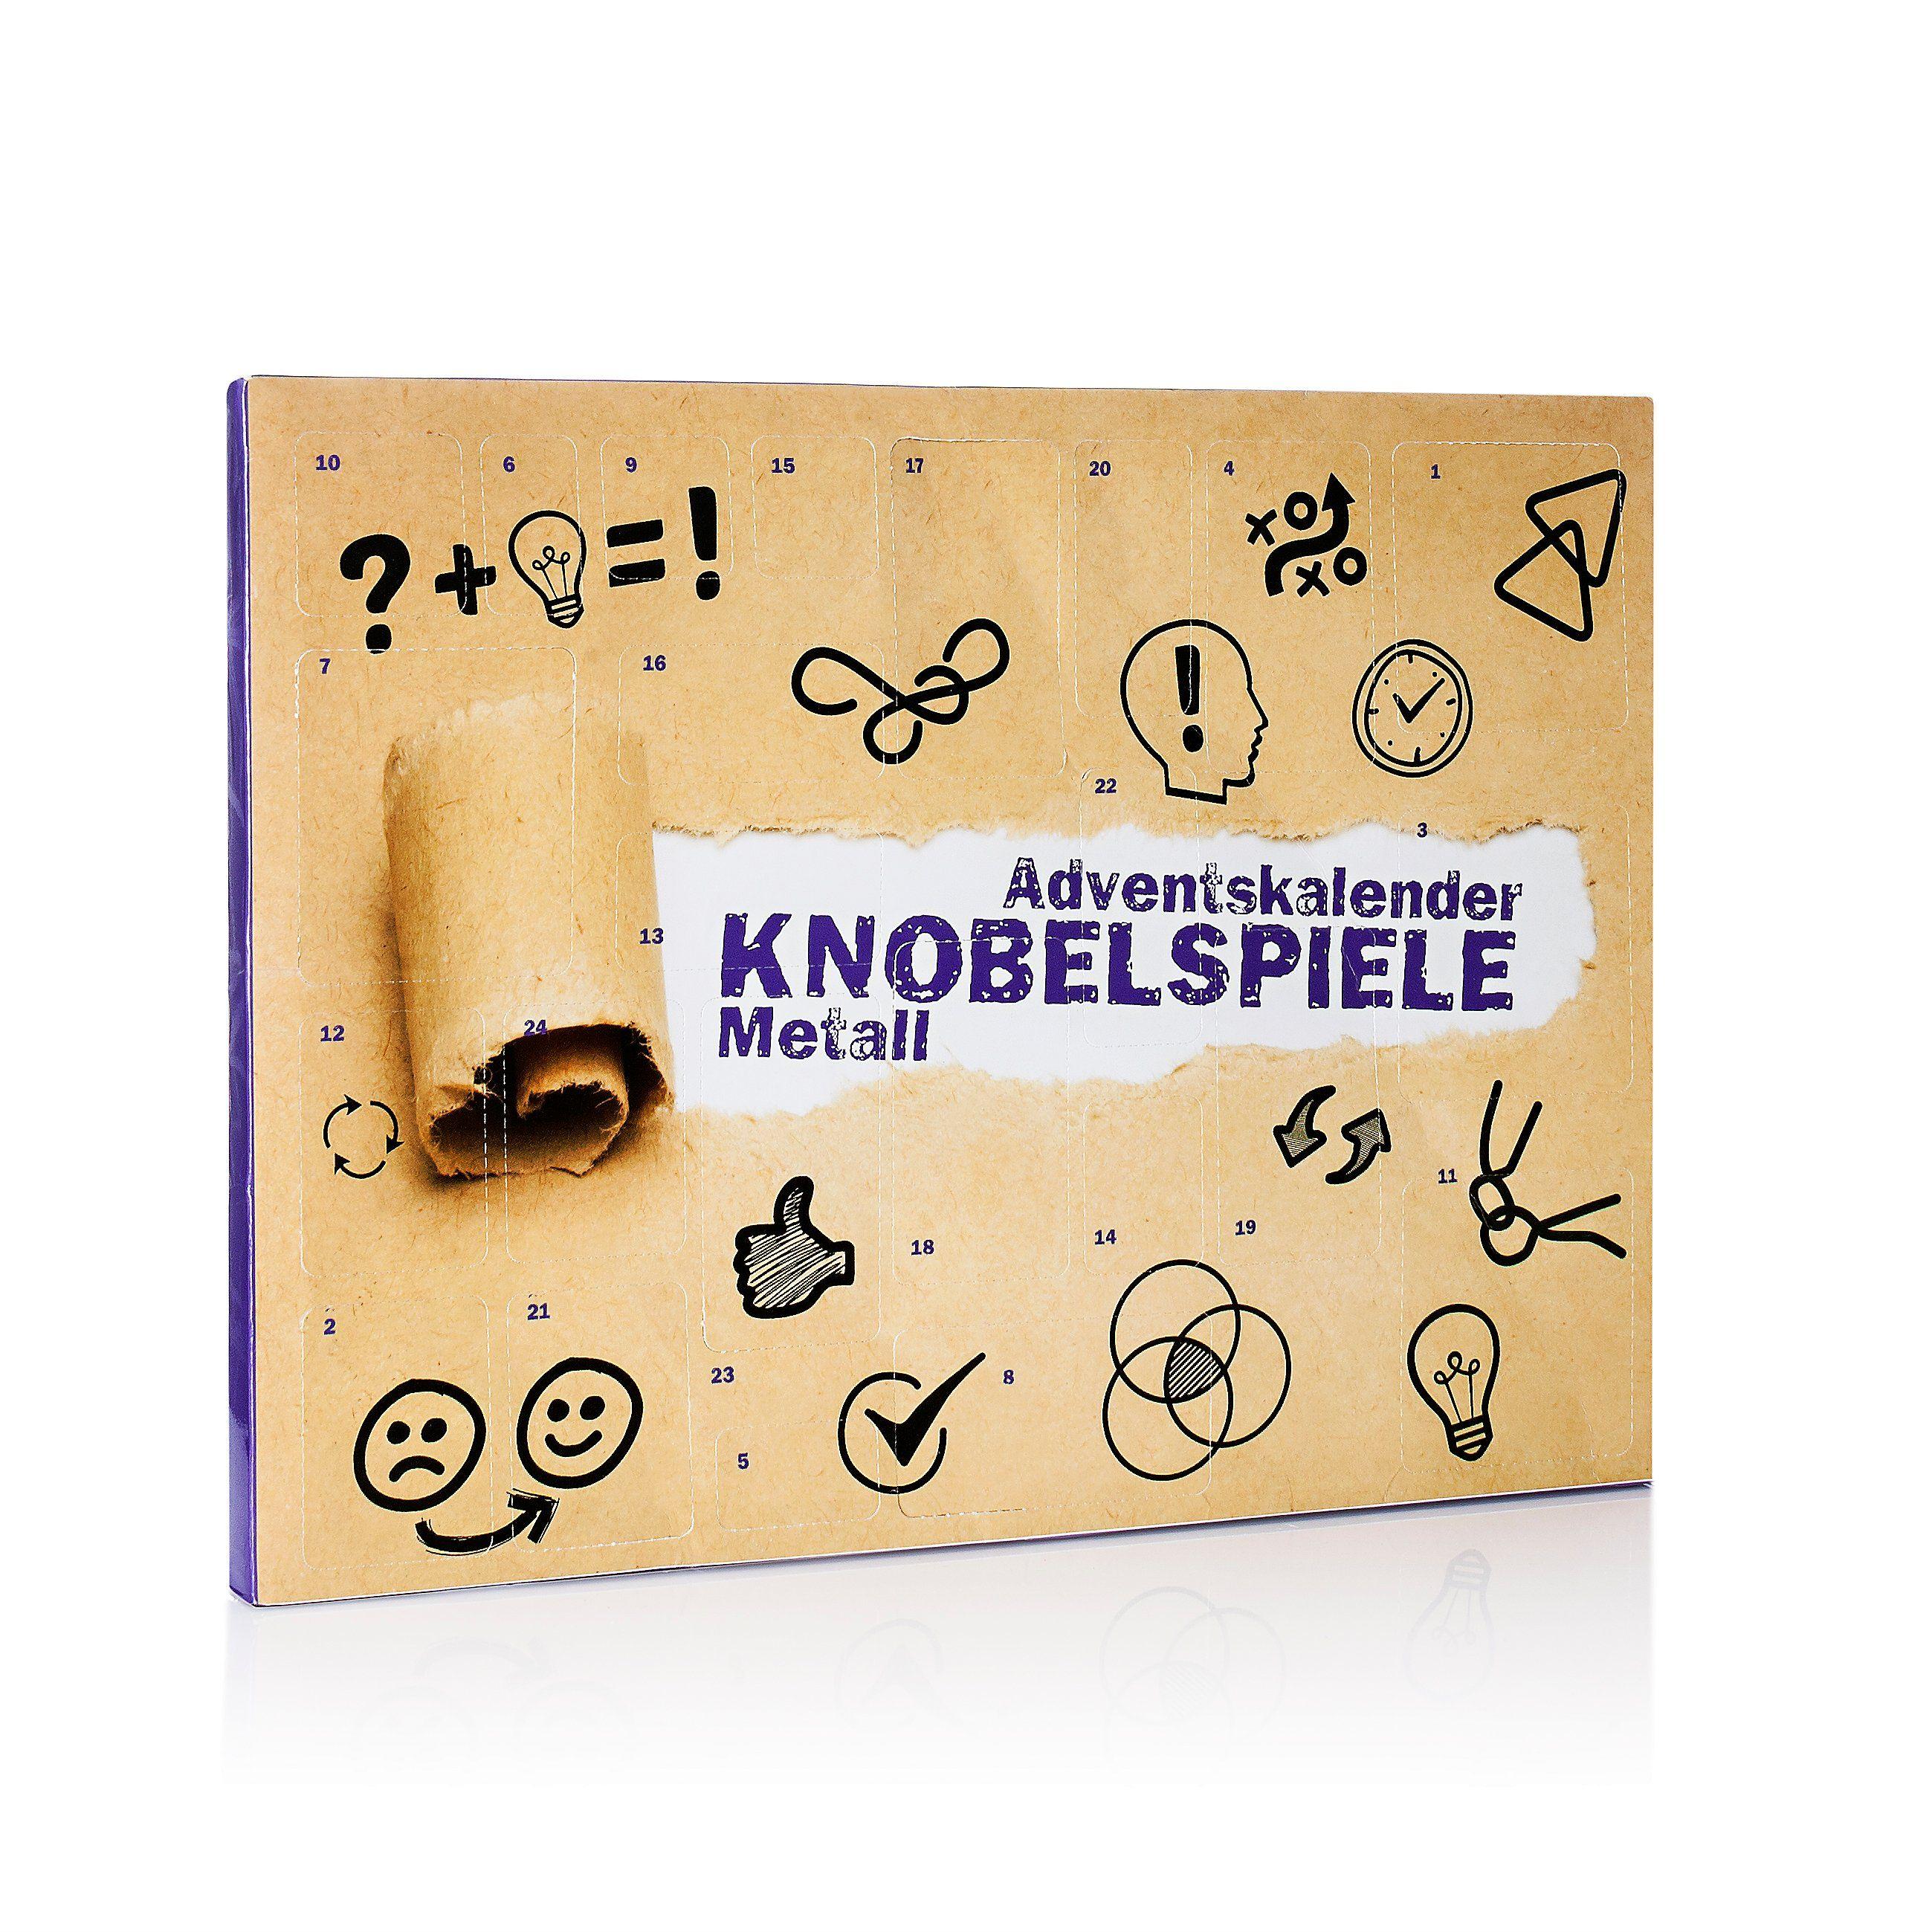 Adventskalender Knobelspiele Metall – Kalender bei Weltbild.de